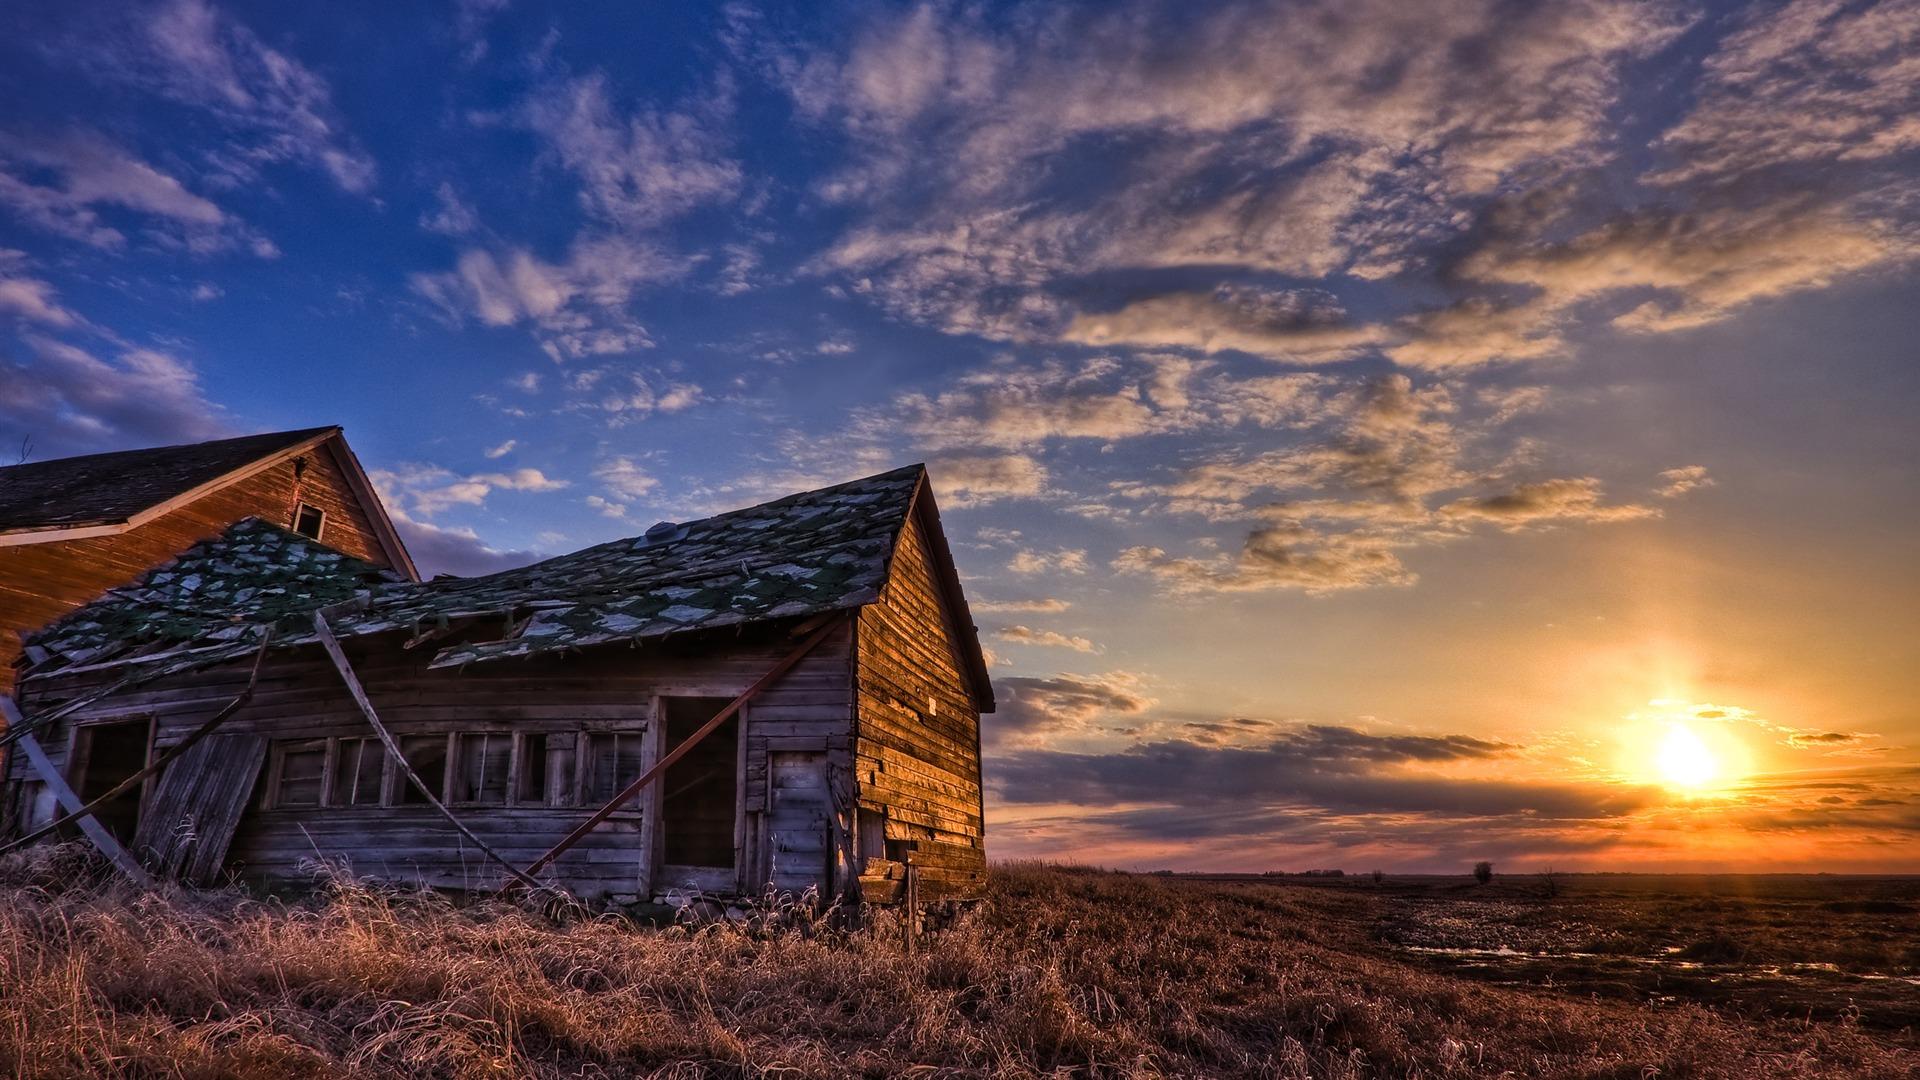 Old rusty farm house in sunset Full HD wallpaper Full HD Wallpapers 1920x1080